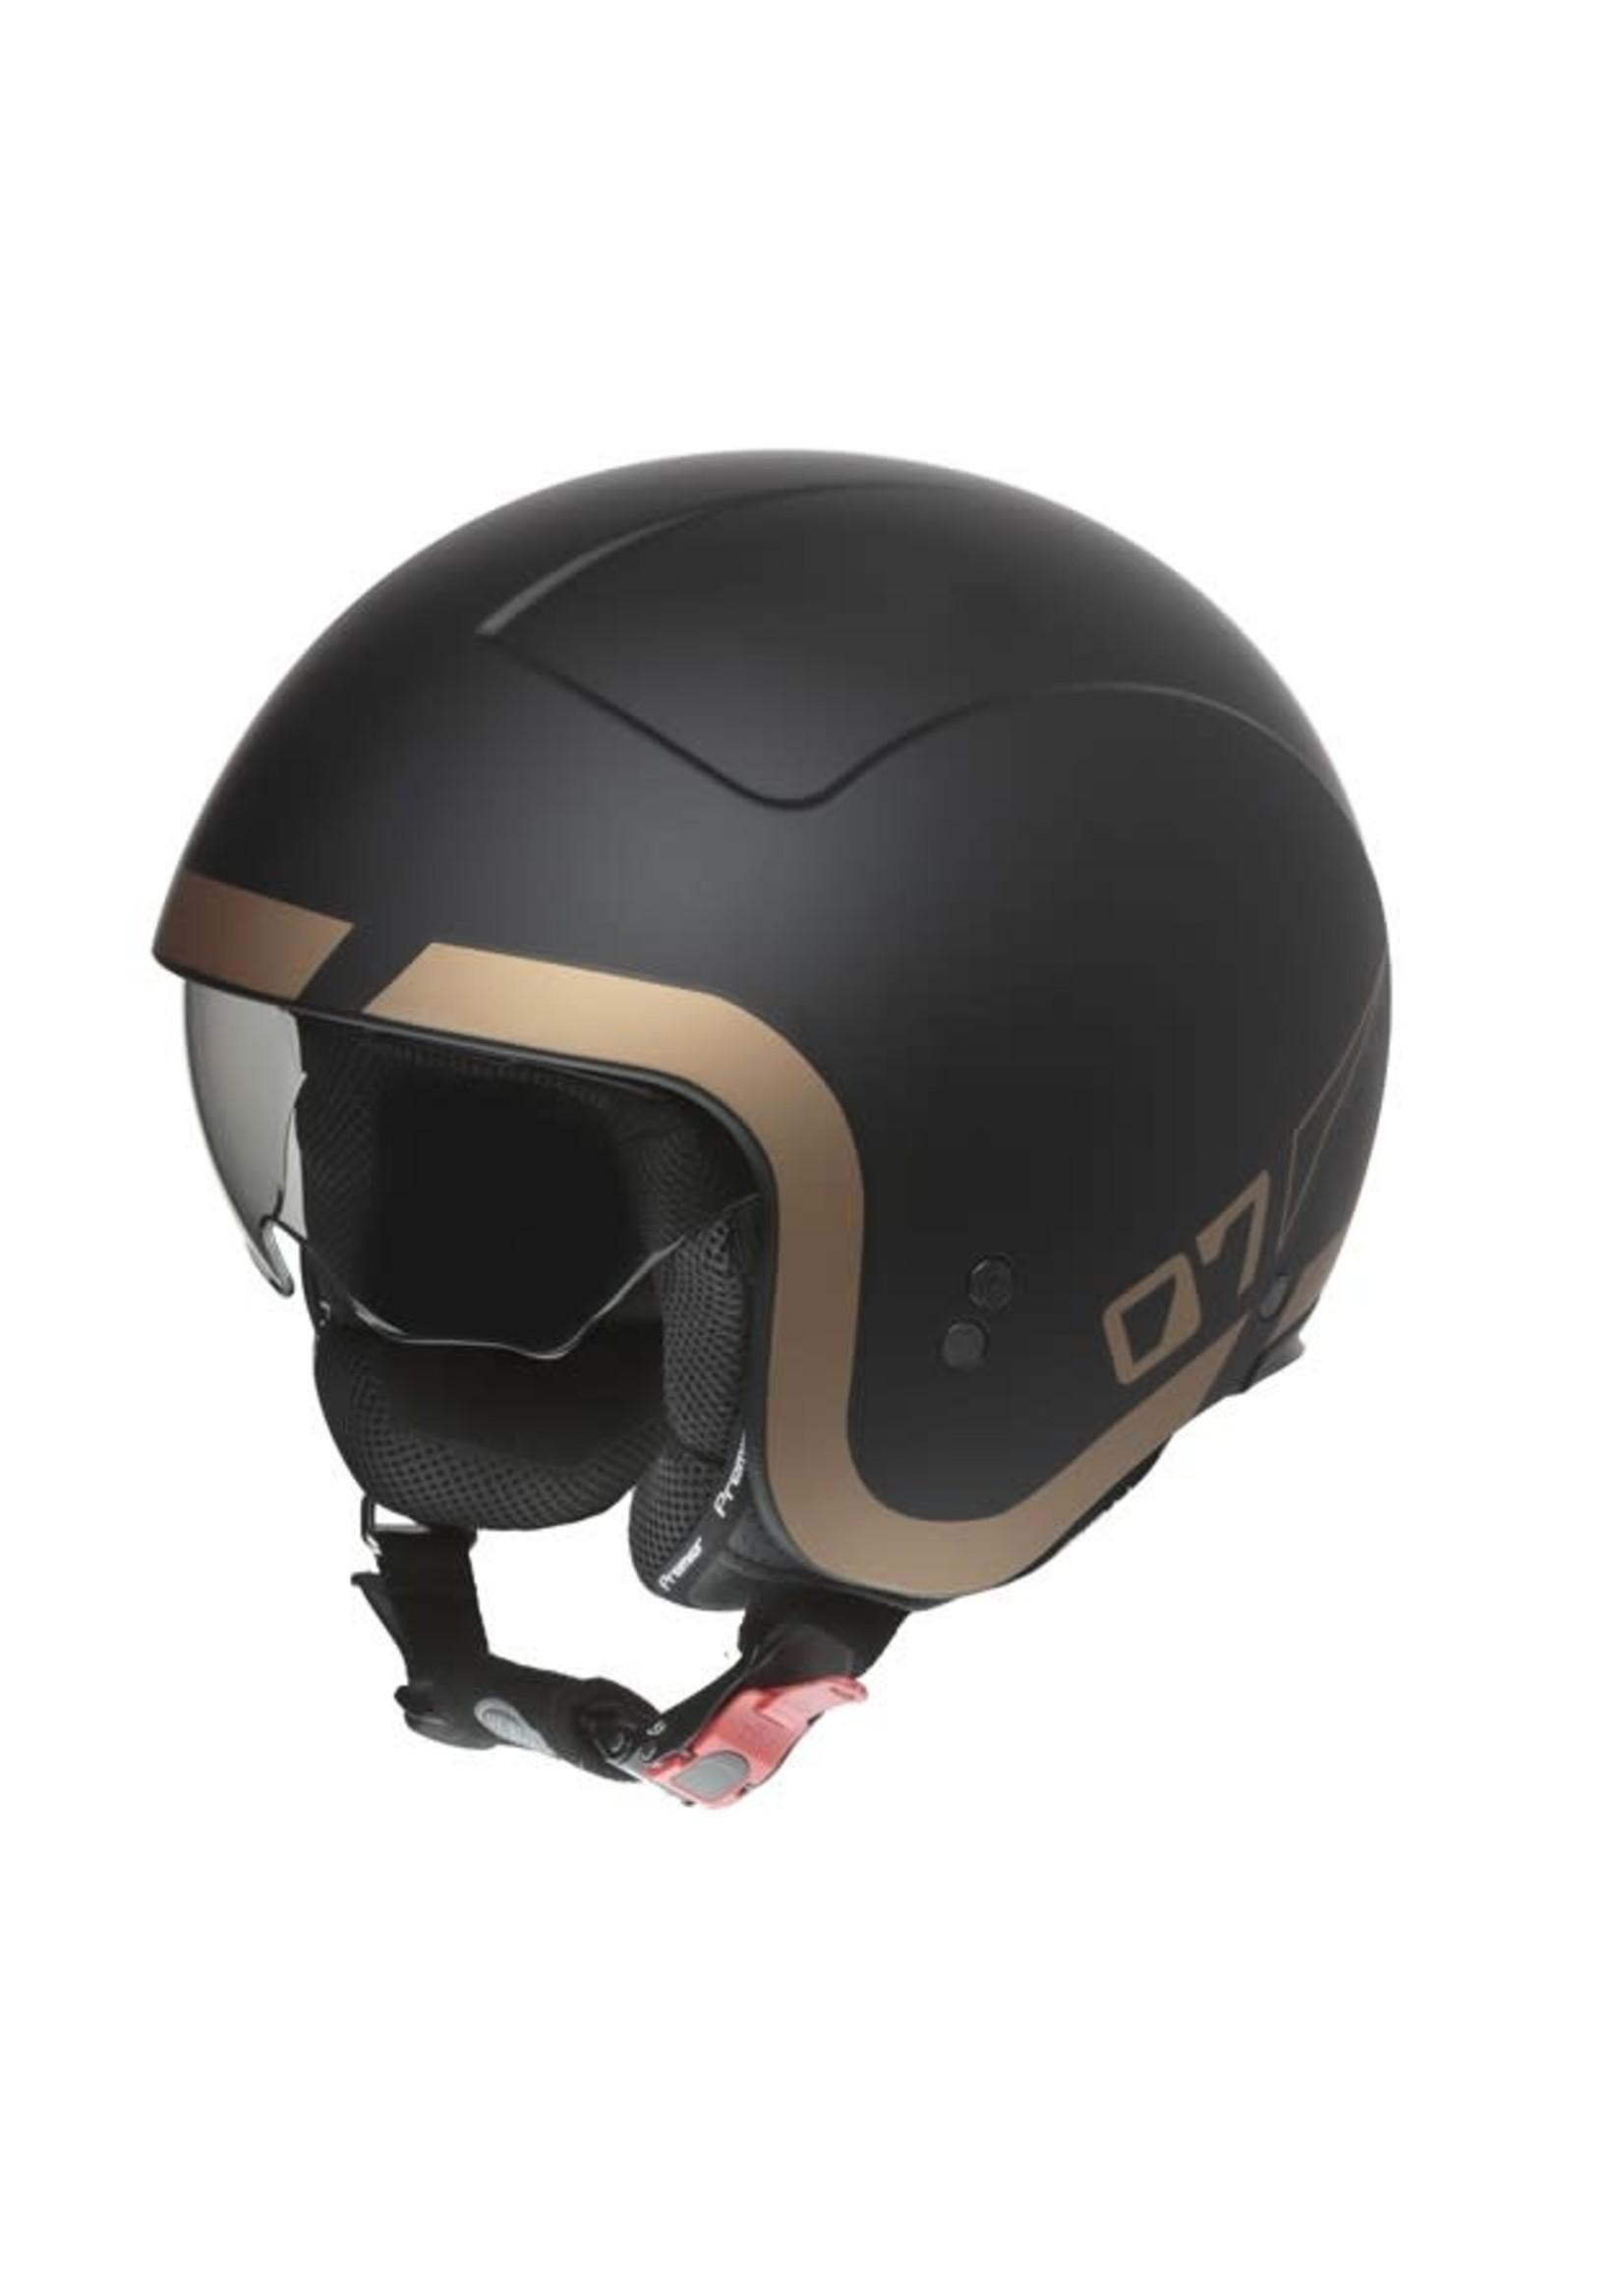 Premier Premier Rocker Helm LN 19 BM